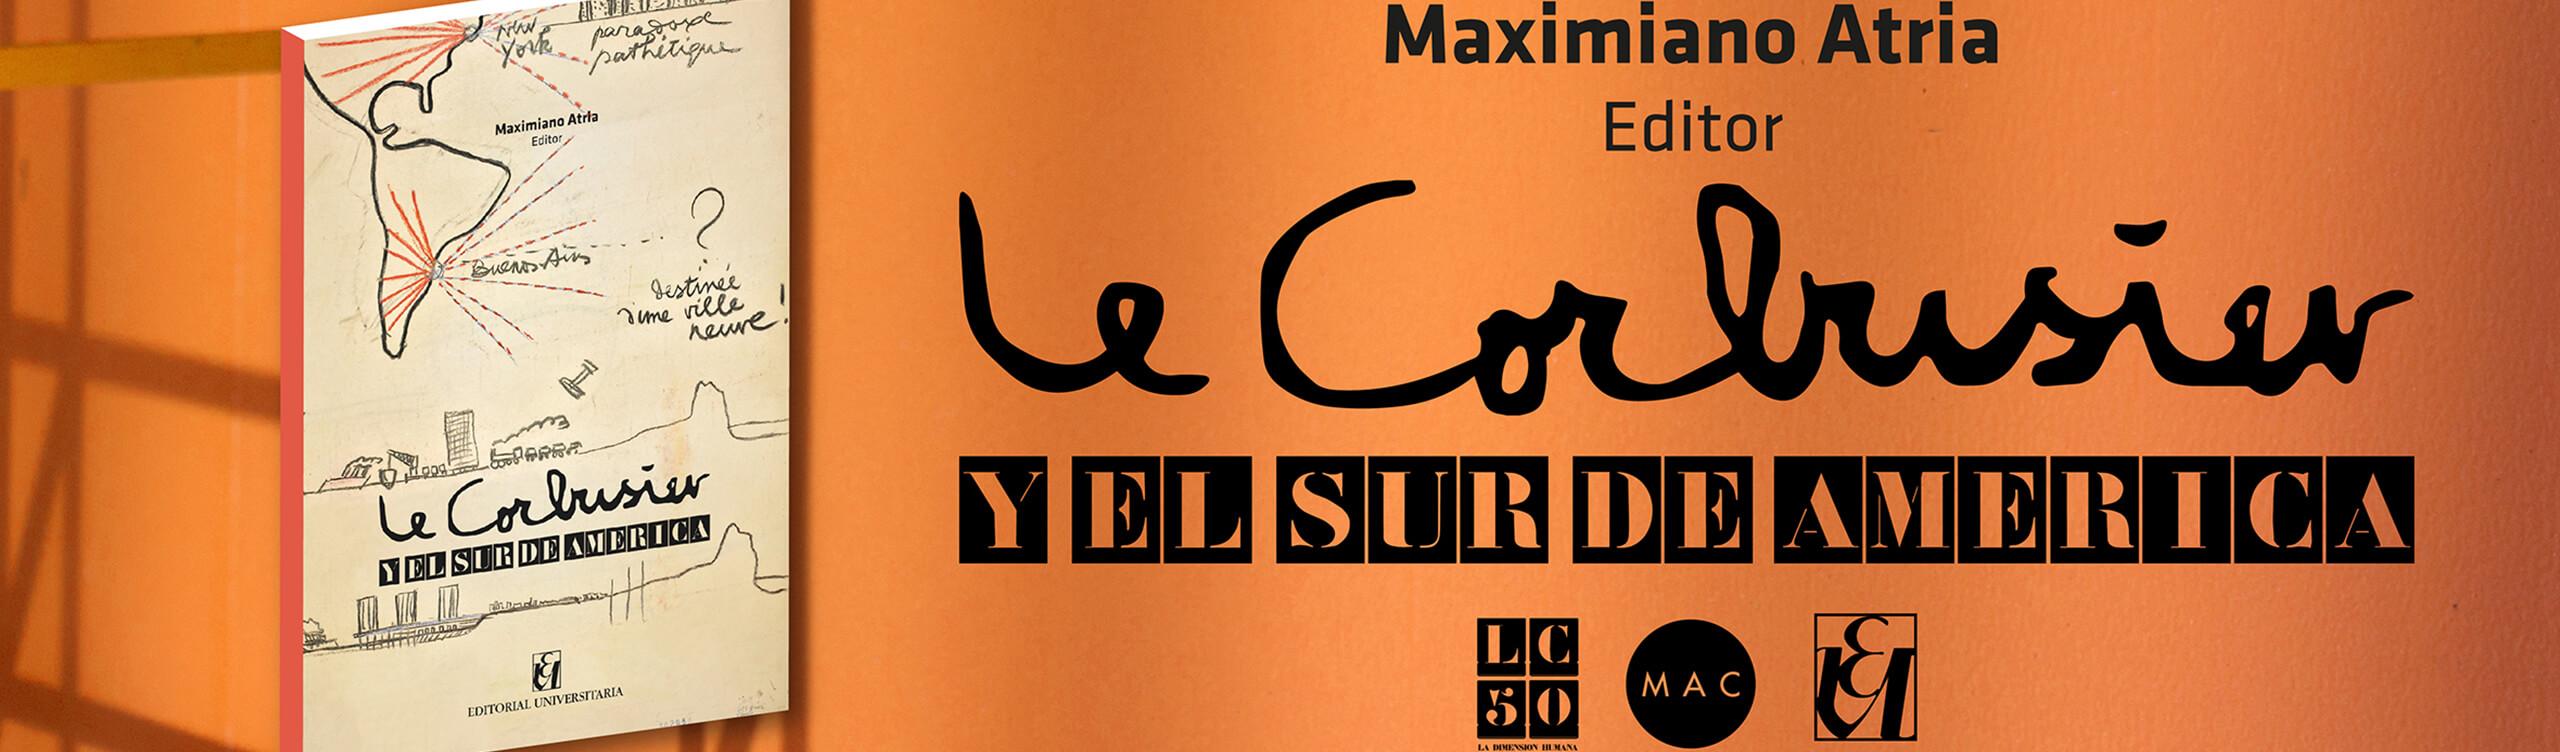 Le Corbusier Editorial Universitaria